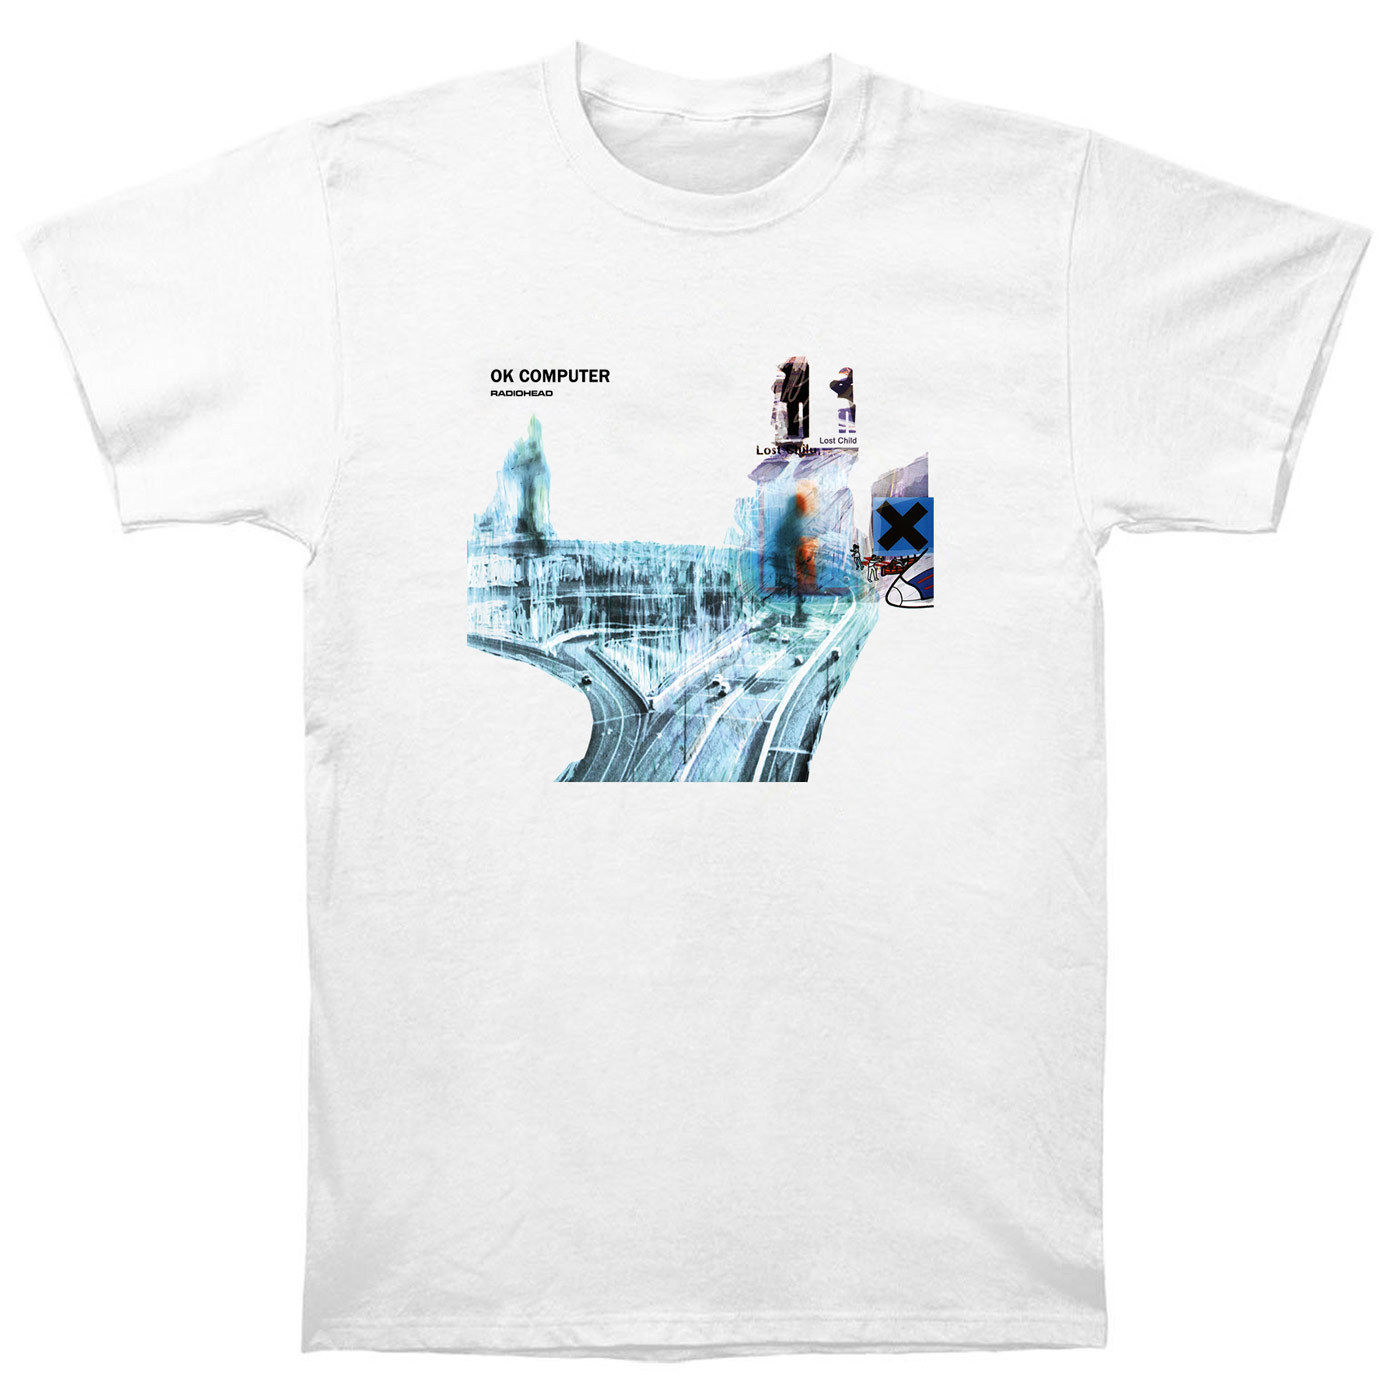 Radiohead Ok Computer T Shirt Cd Lp Vinyl Poster In Rainbows Thom Yorke Druck T-Shirt Männer Sommer Stil Mode Top t